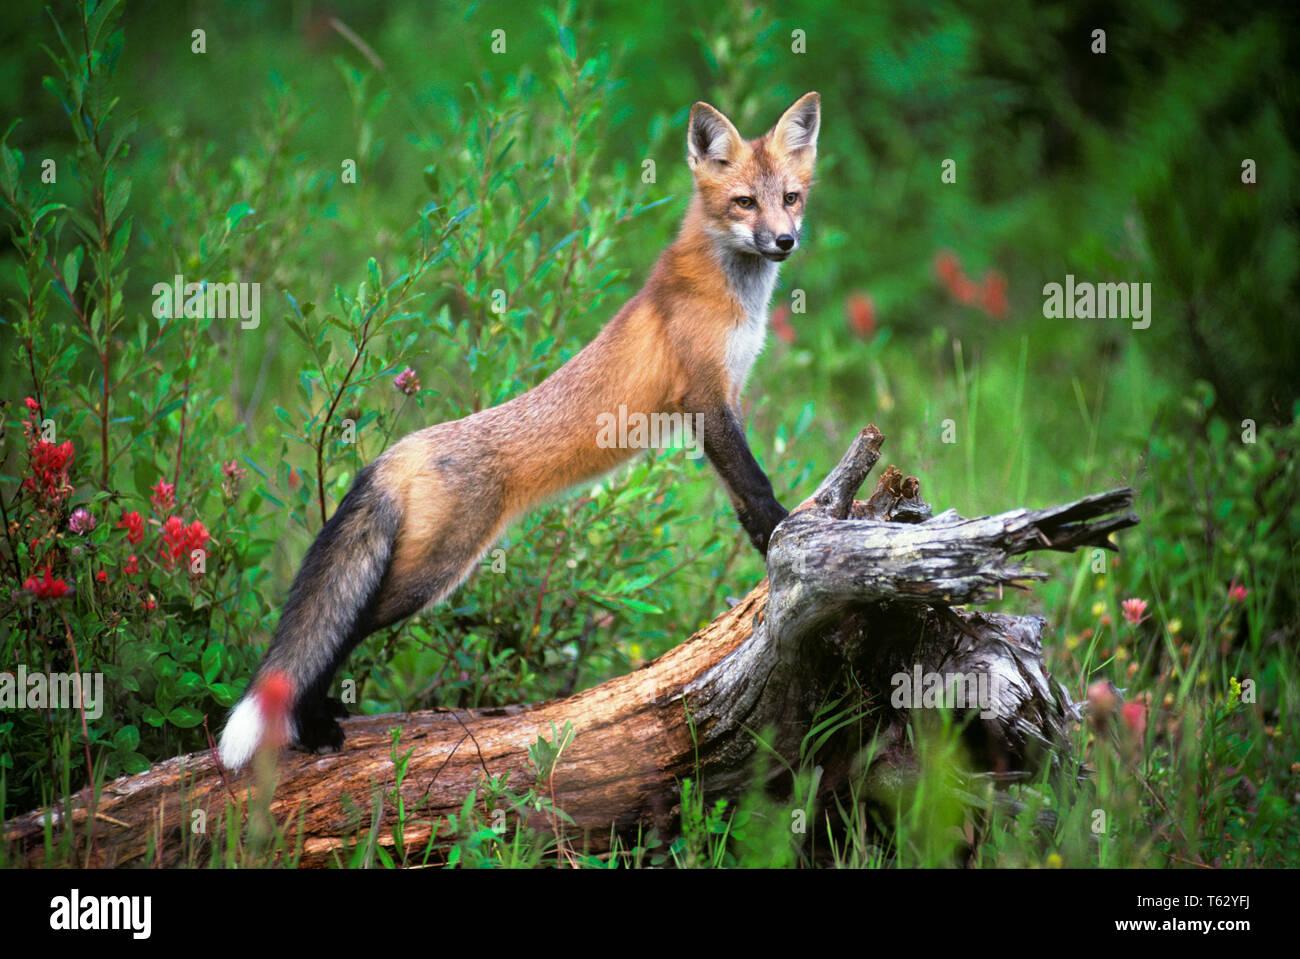 RED FOX Vulpes vulpes STANDING ON LOG - kz4440 ULR001 HARS BUSHY CLEVER CURIOUS ECOLOGY SLIM VULPES SMART TRICKY BIG EAR CANINE SLENDER STUMP VEGETATION VULPES VULPES WILDLIFE CURIOSITY FAUNA INTELLIGENCE - Stock Image